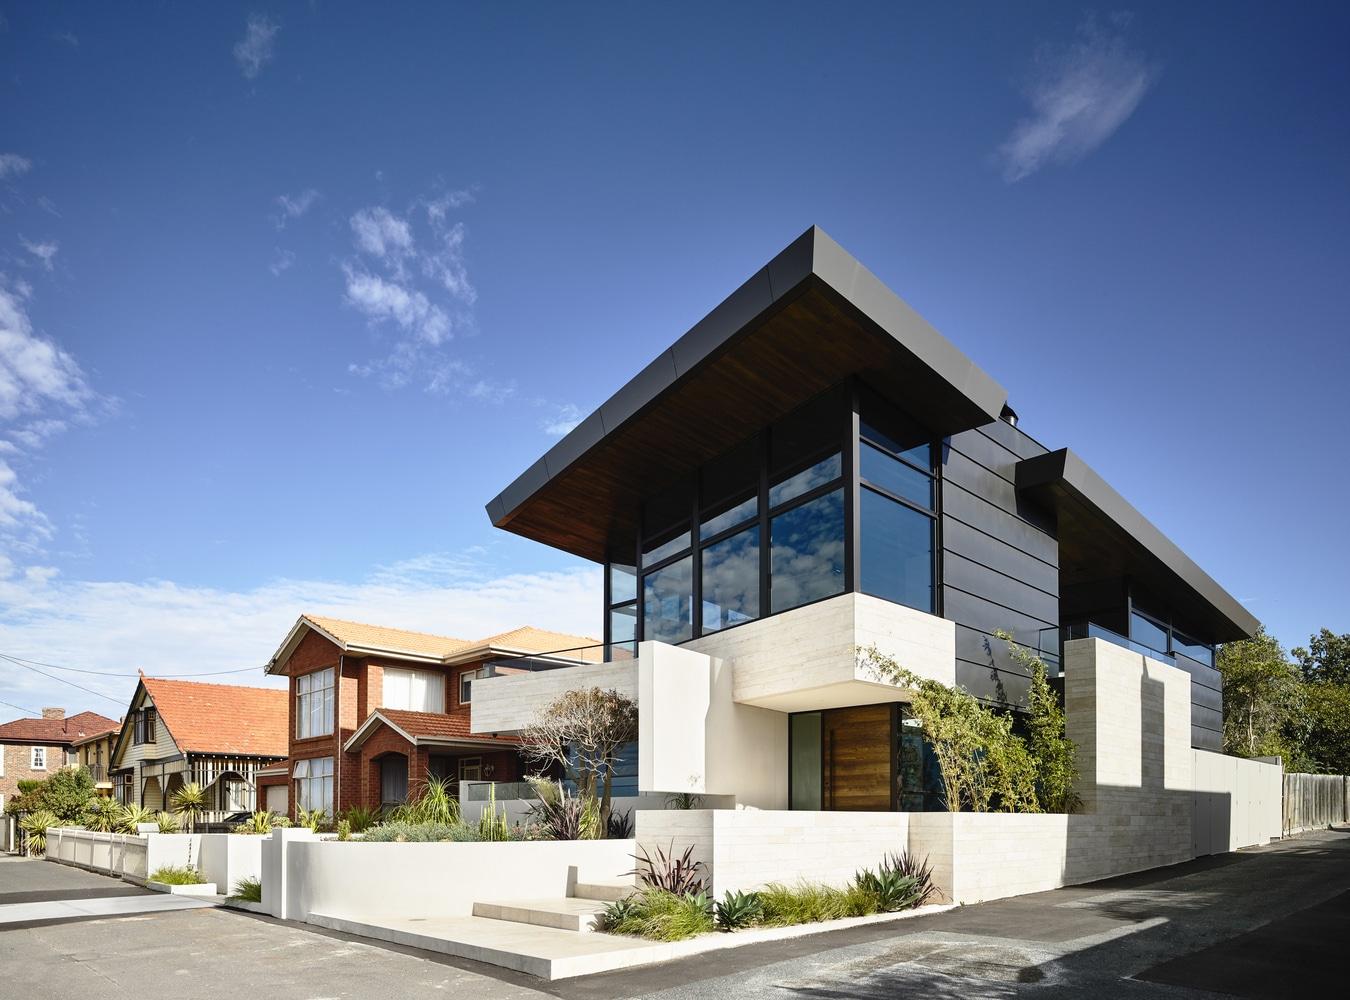 Planos de casa moderna de dos pisos for Planos para casas de dos pisos modernas